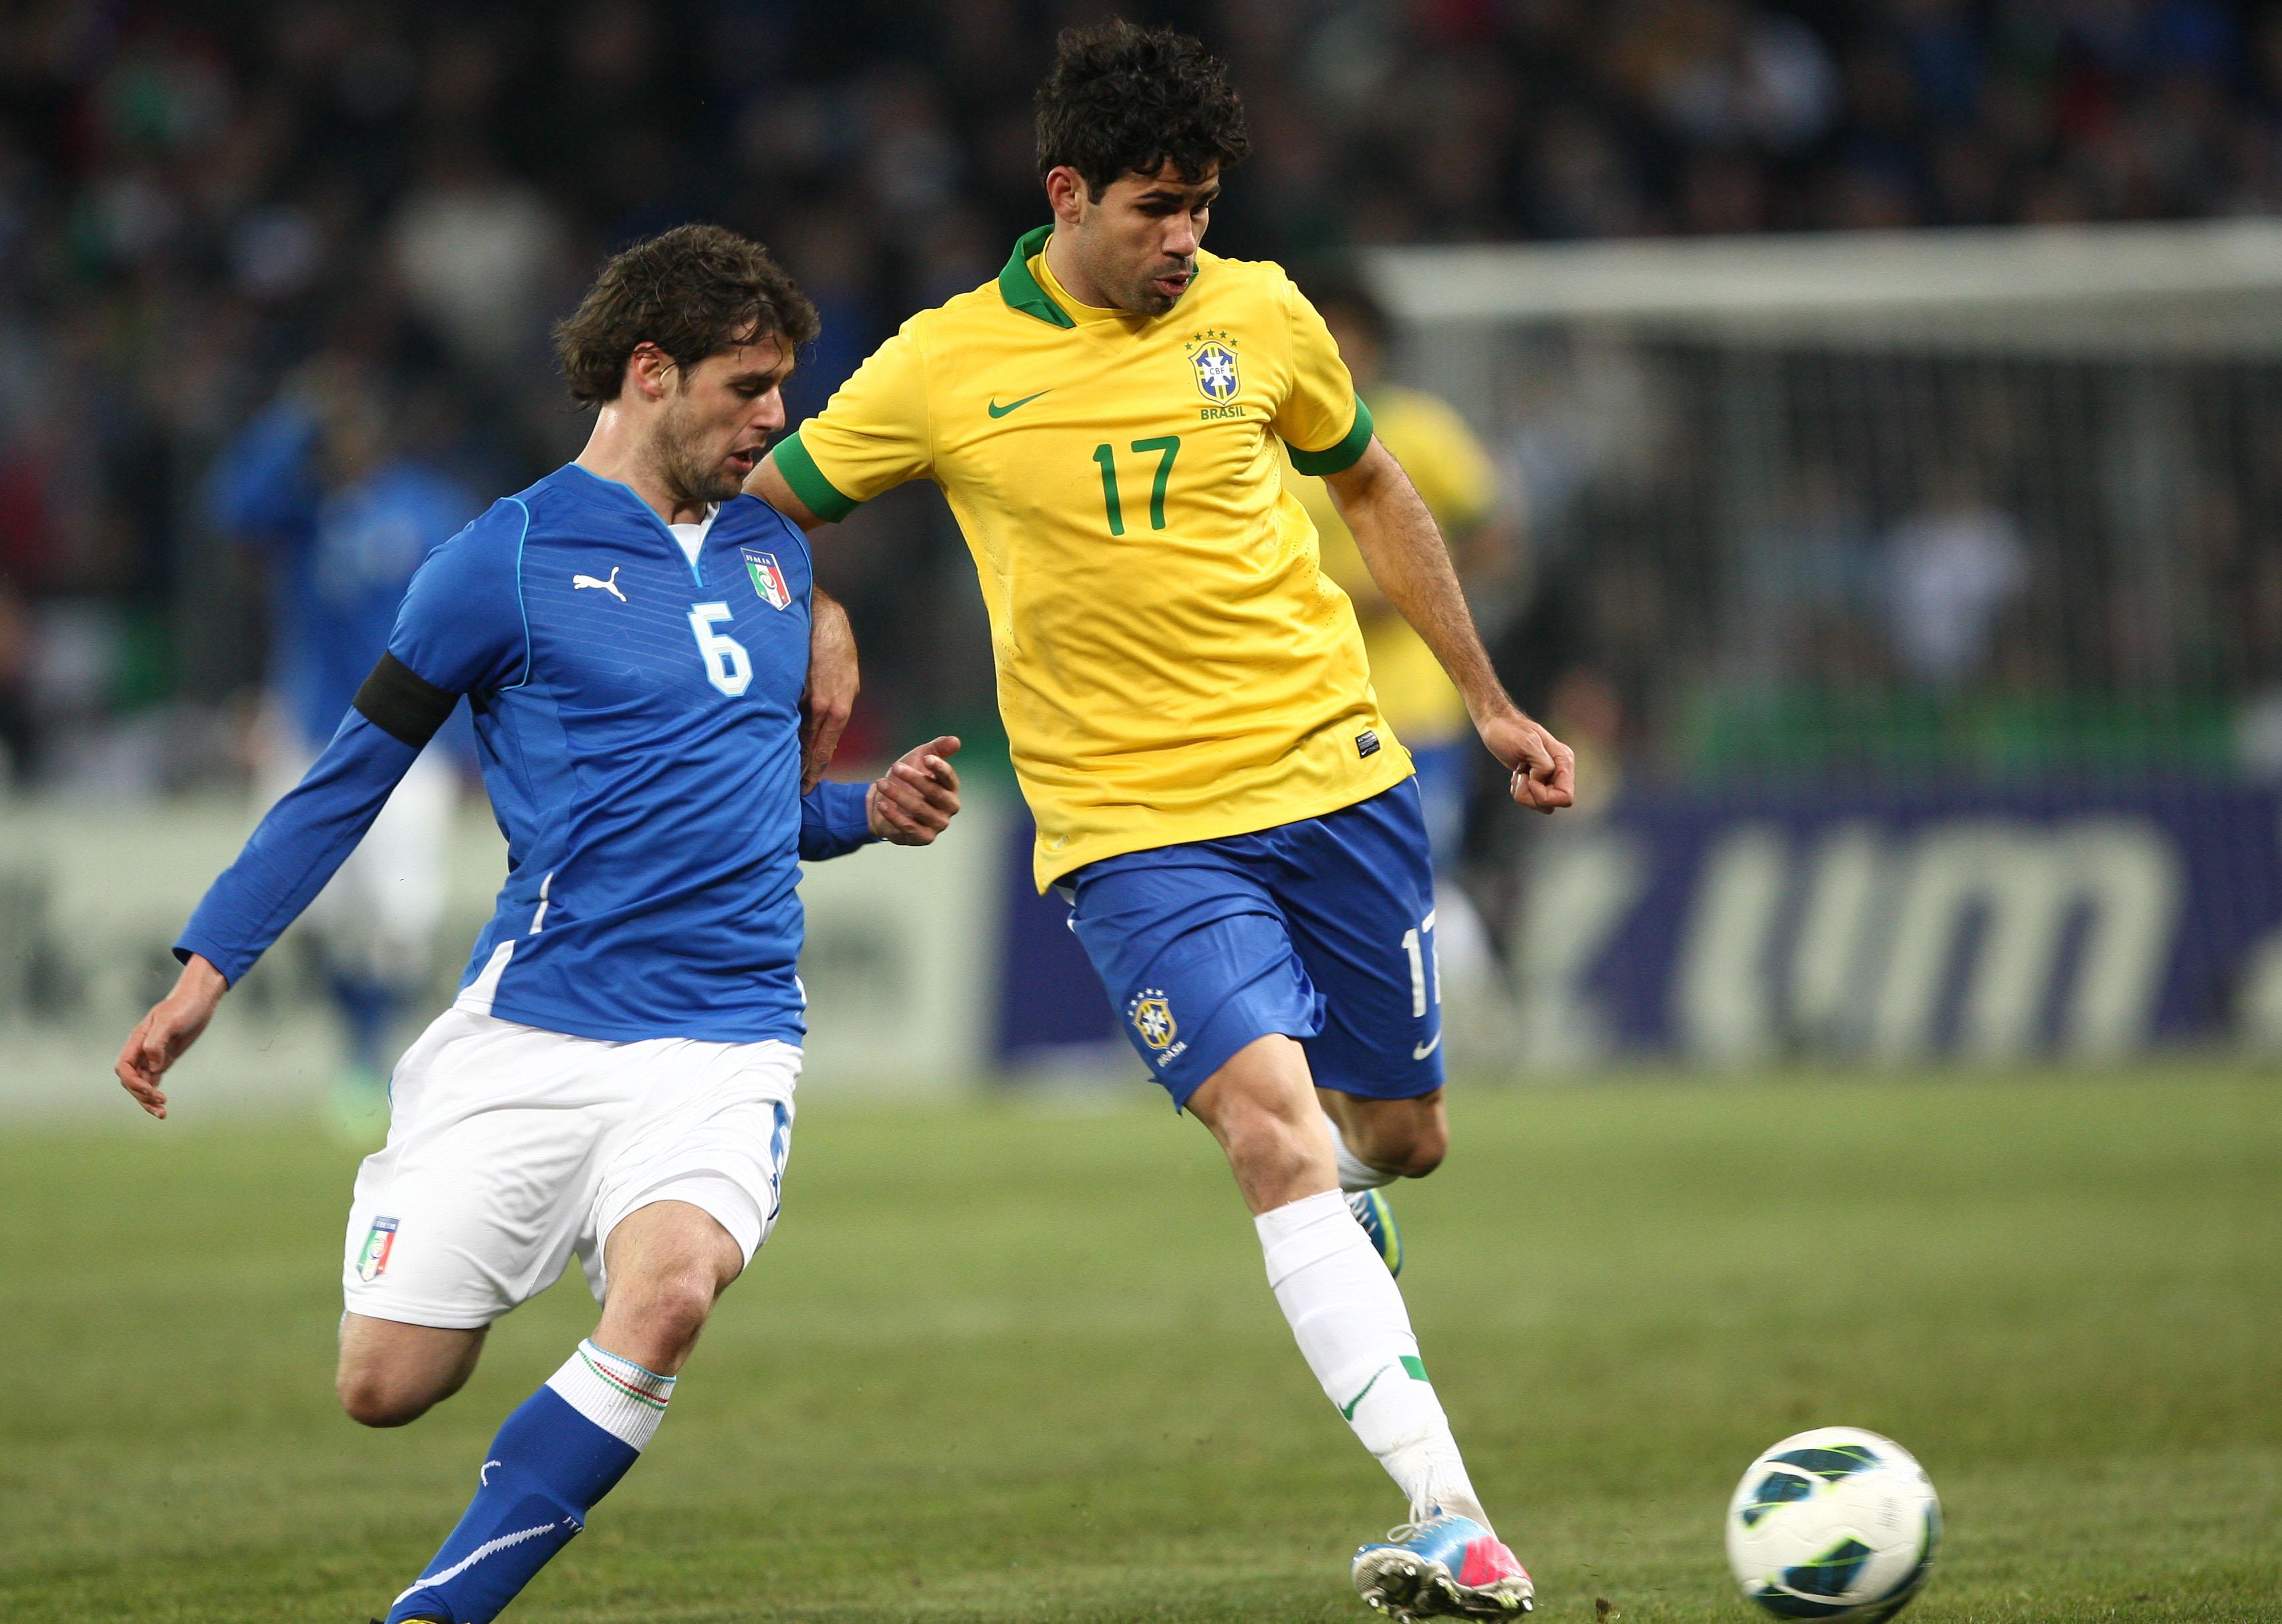 Diego Costa Brazil Italy 21032013 - Goal.com